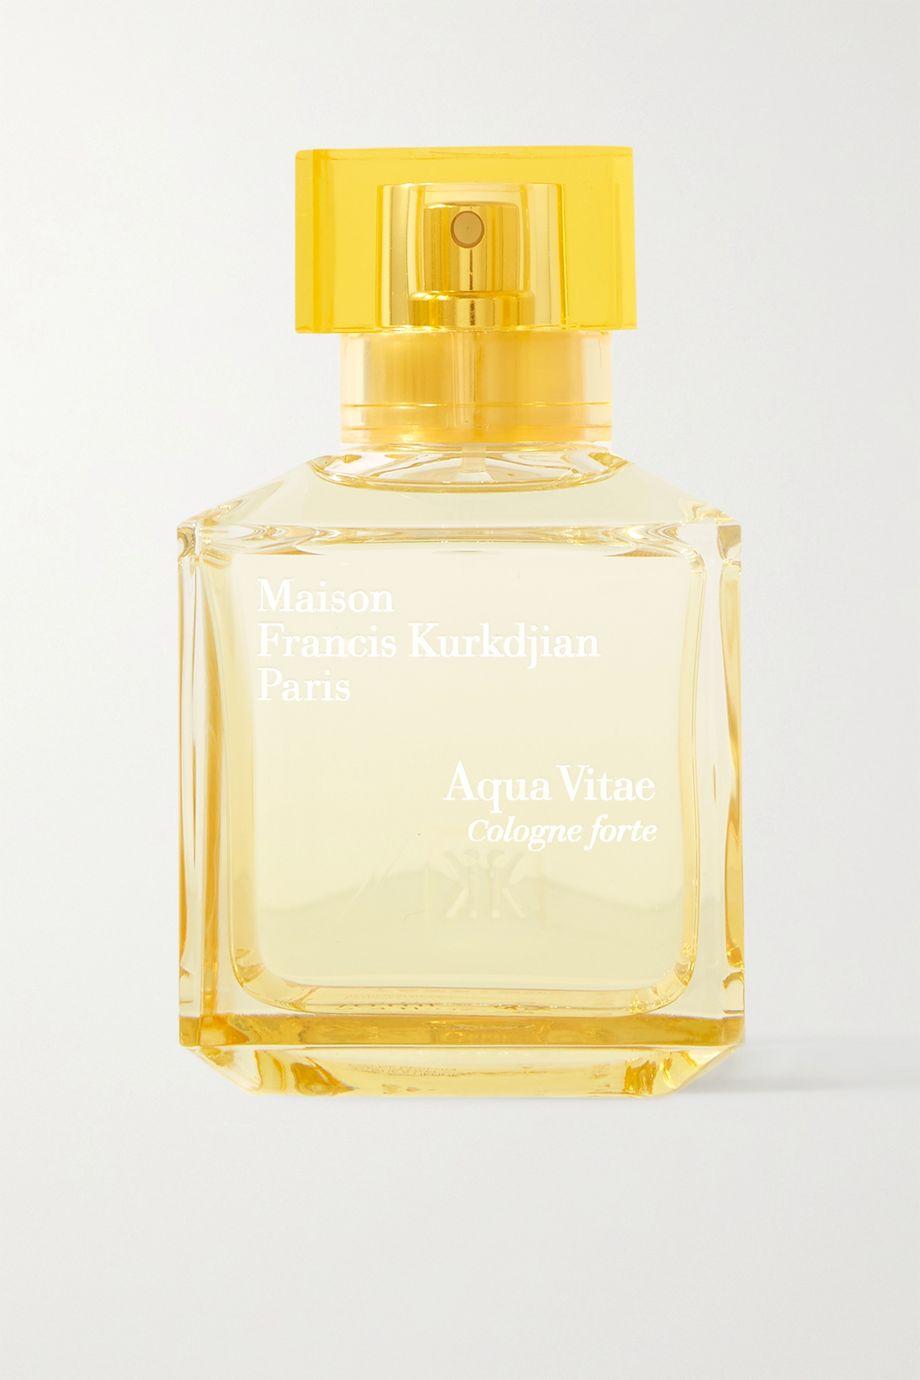 Maison Francis Kurkdjian Aqua Vitae Forte, 70 ml – Eau de Parfum